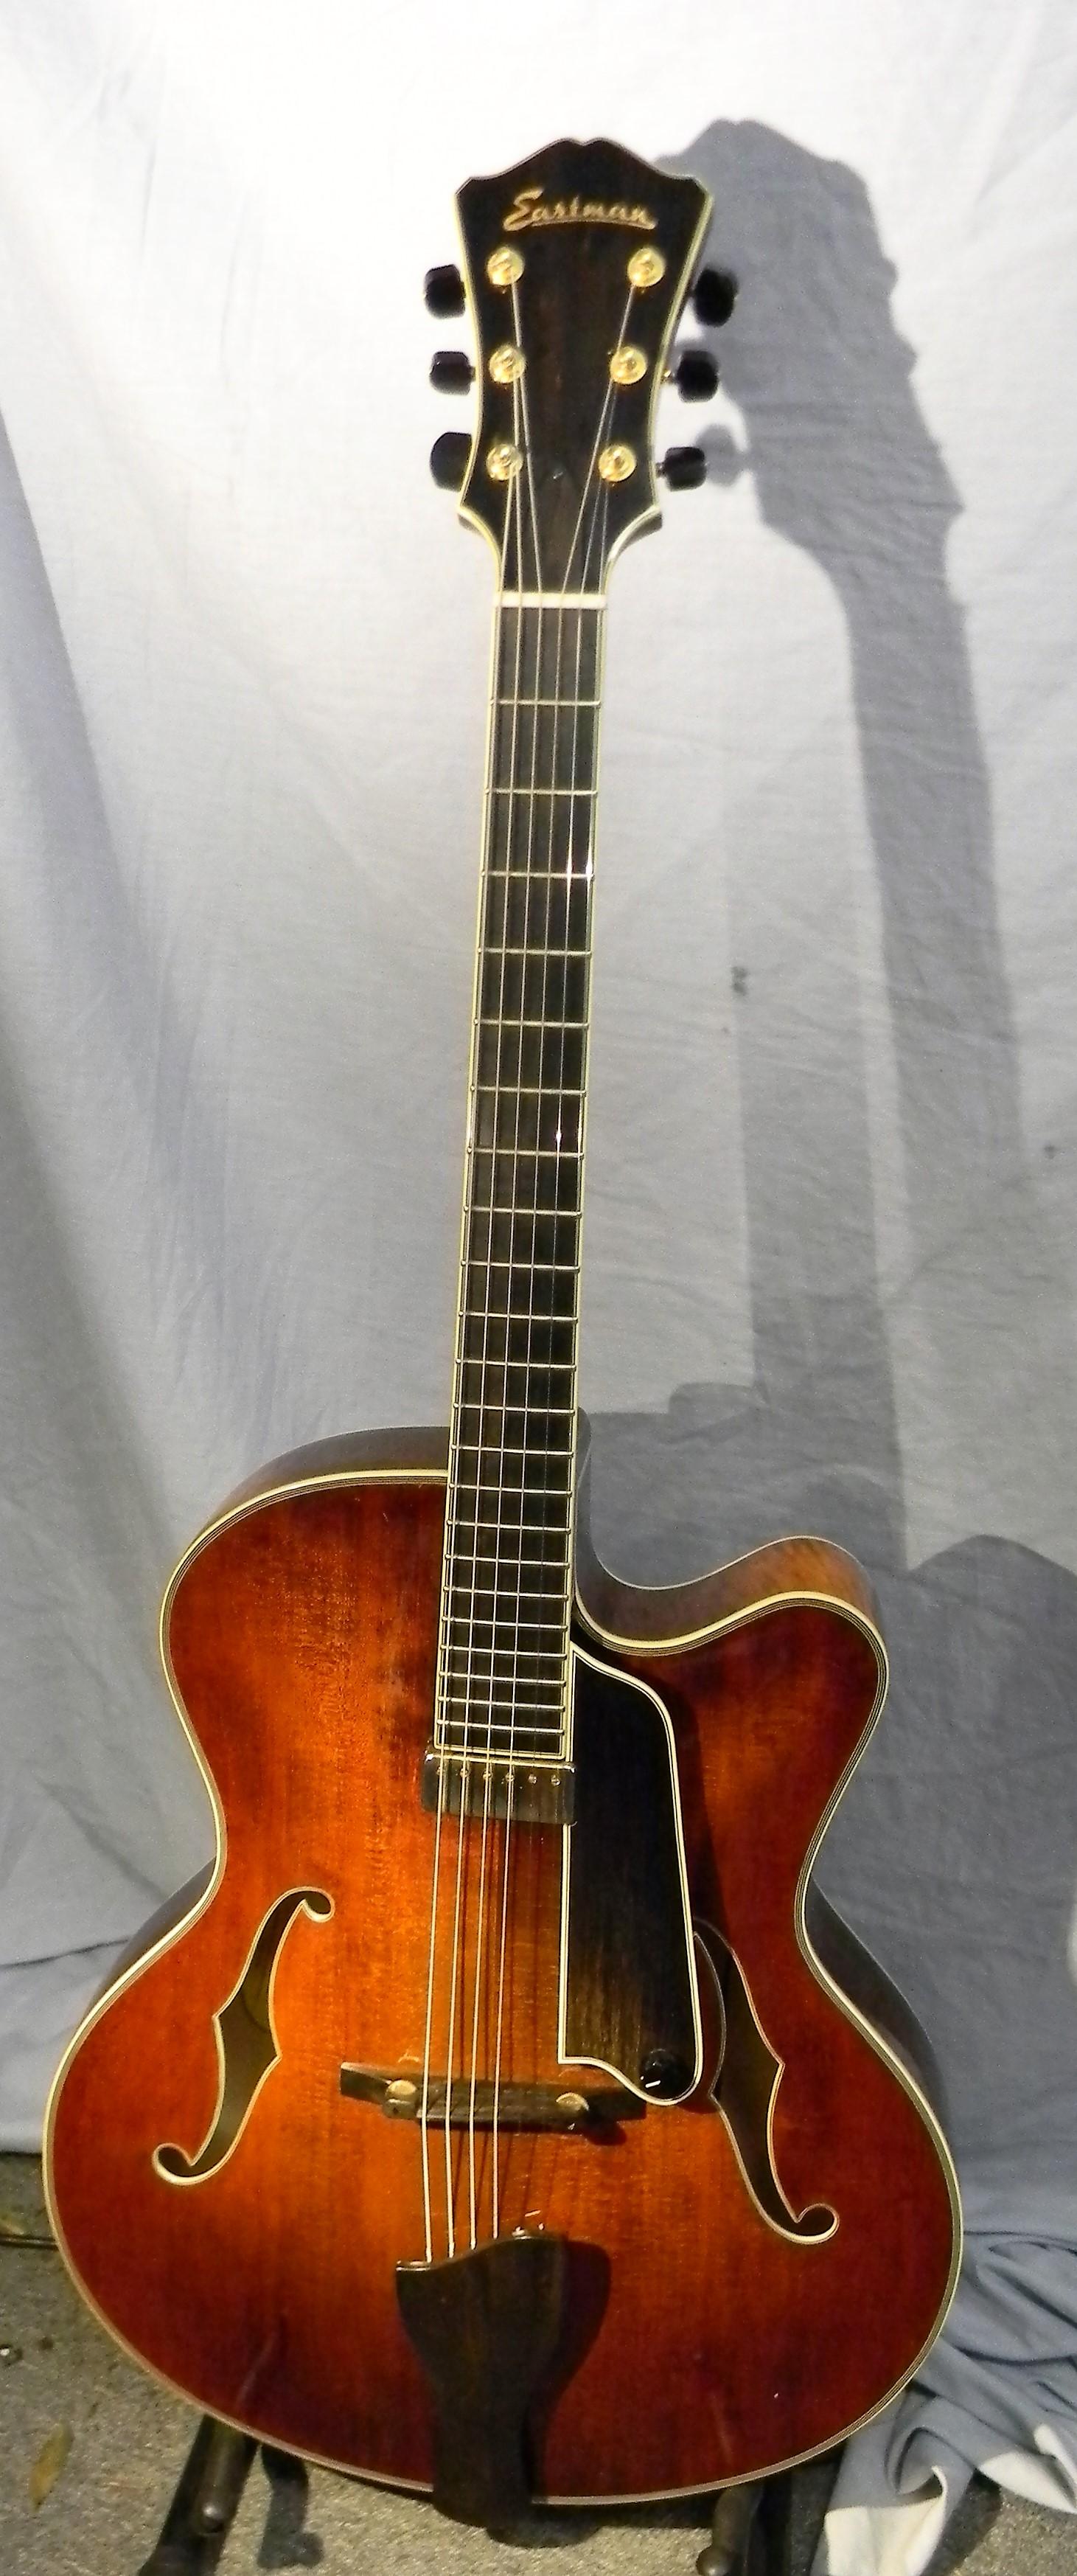 dscn5850 san antonio guitar store guitar tex. Black Bedroom Furniture Sets. Home Design Ideas